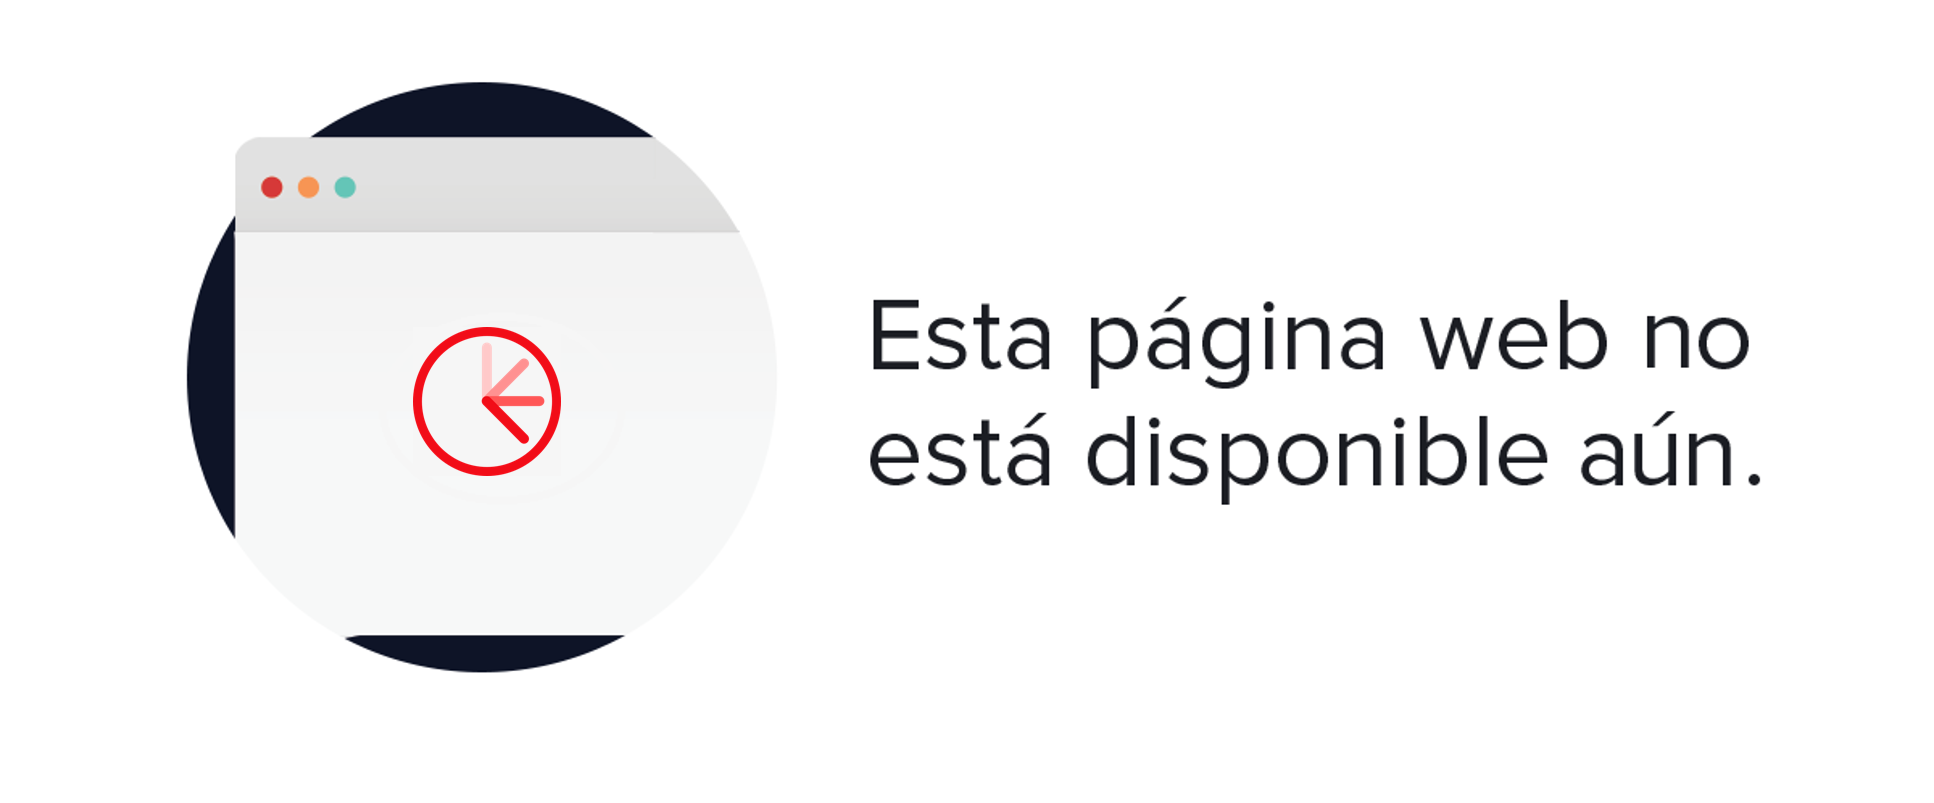 Bolsas de Papel Personalizadas con Asa Plana Medidas 32+16x44 cm 90gr